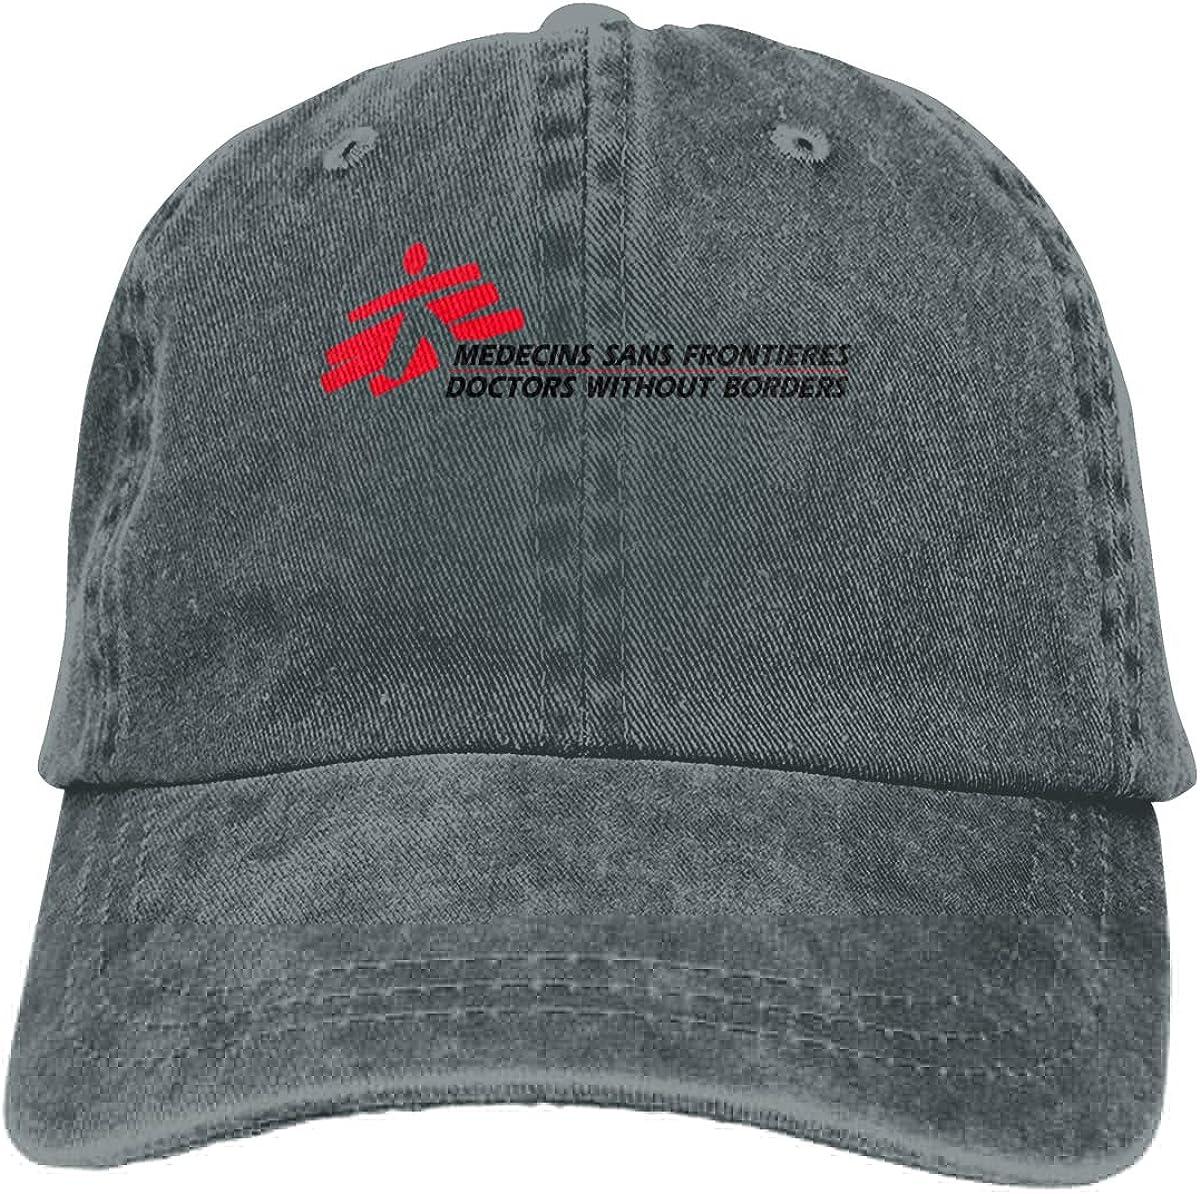 DIY Medecins-Sans-Frontieres-Doctors-Without-Borders Custom Fashion Baseball Hatblack